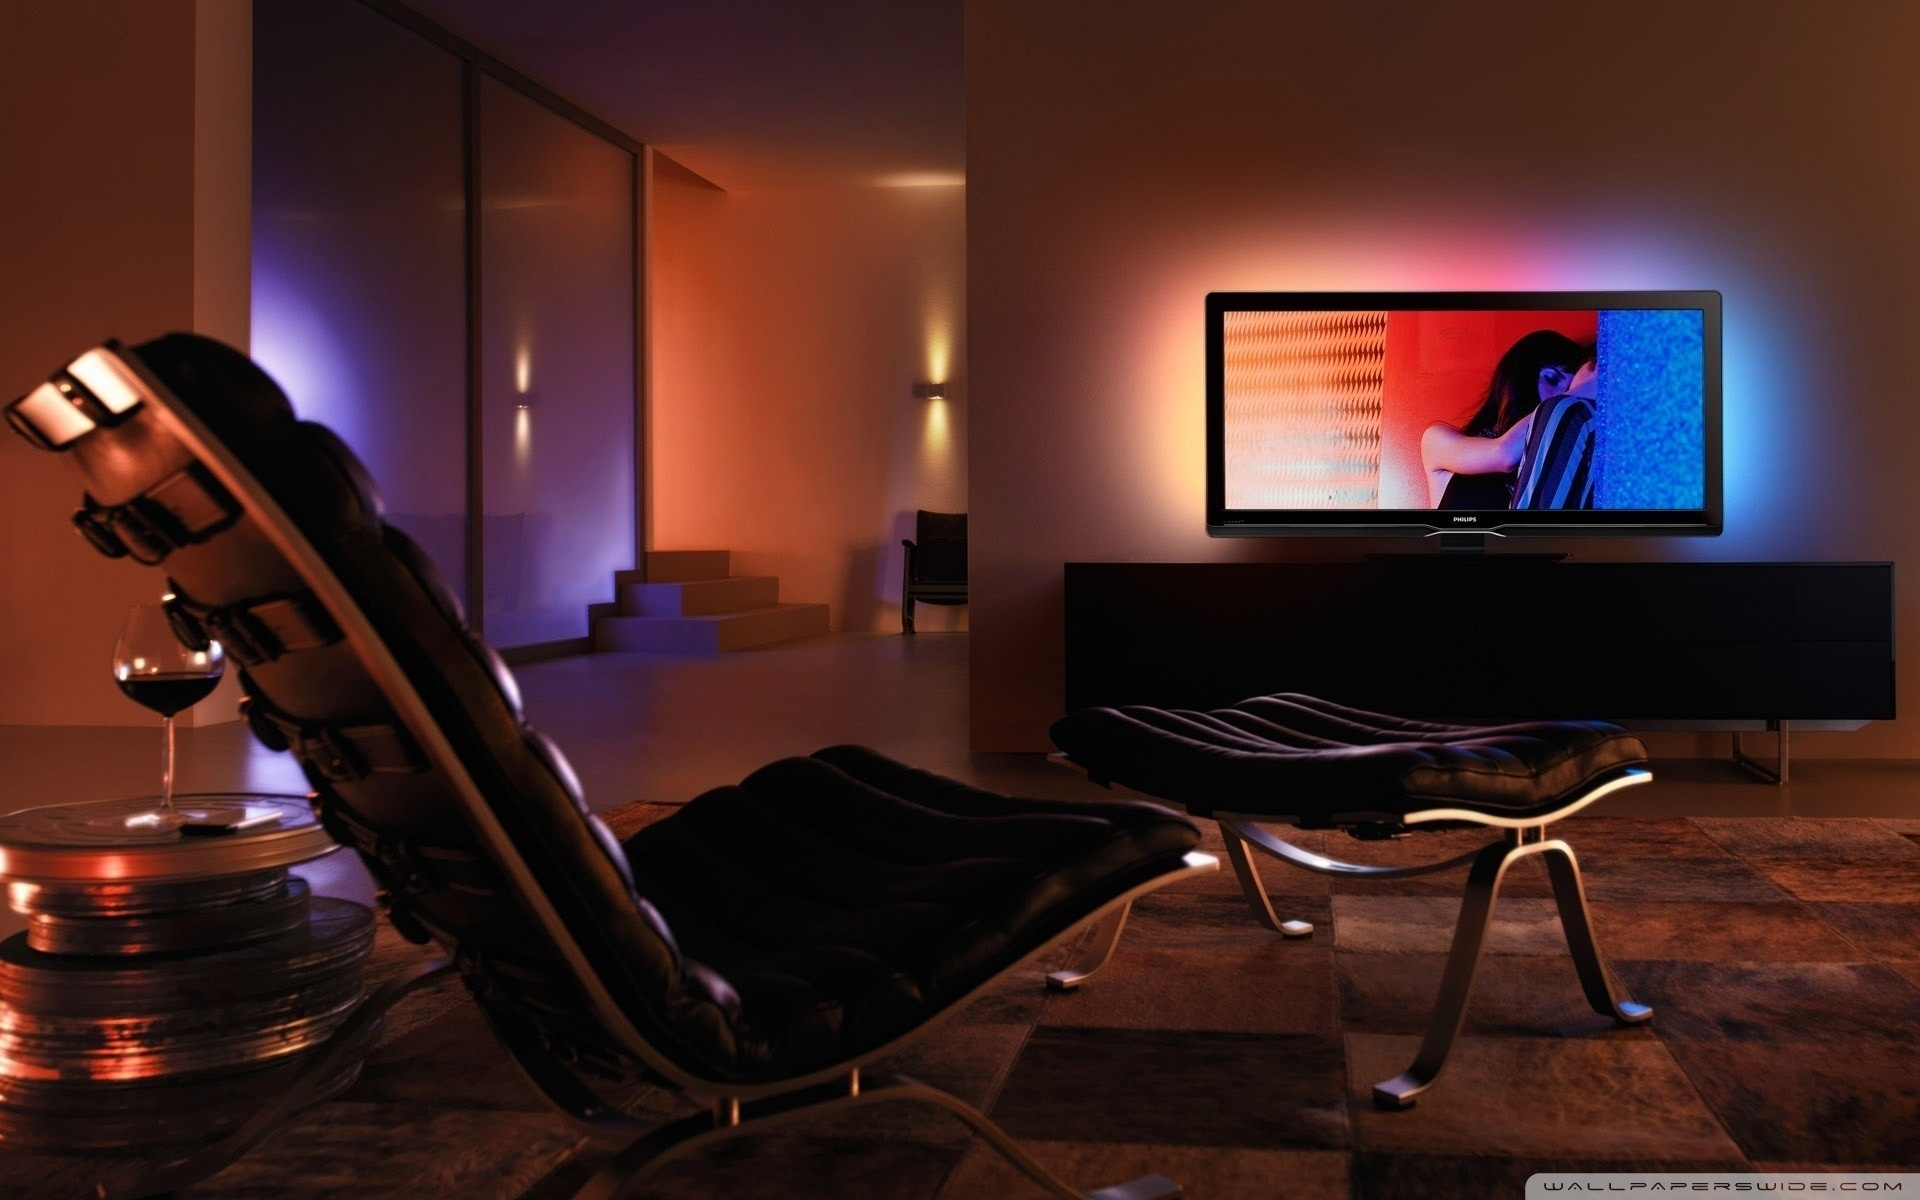 media center living room ❤ 4k hd desktop wallpaper for 4k ultra hd